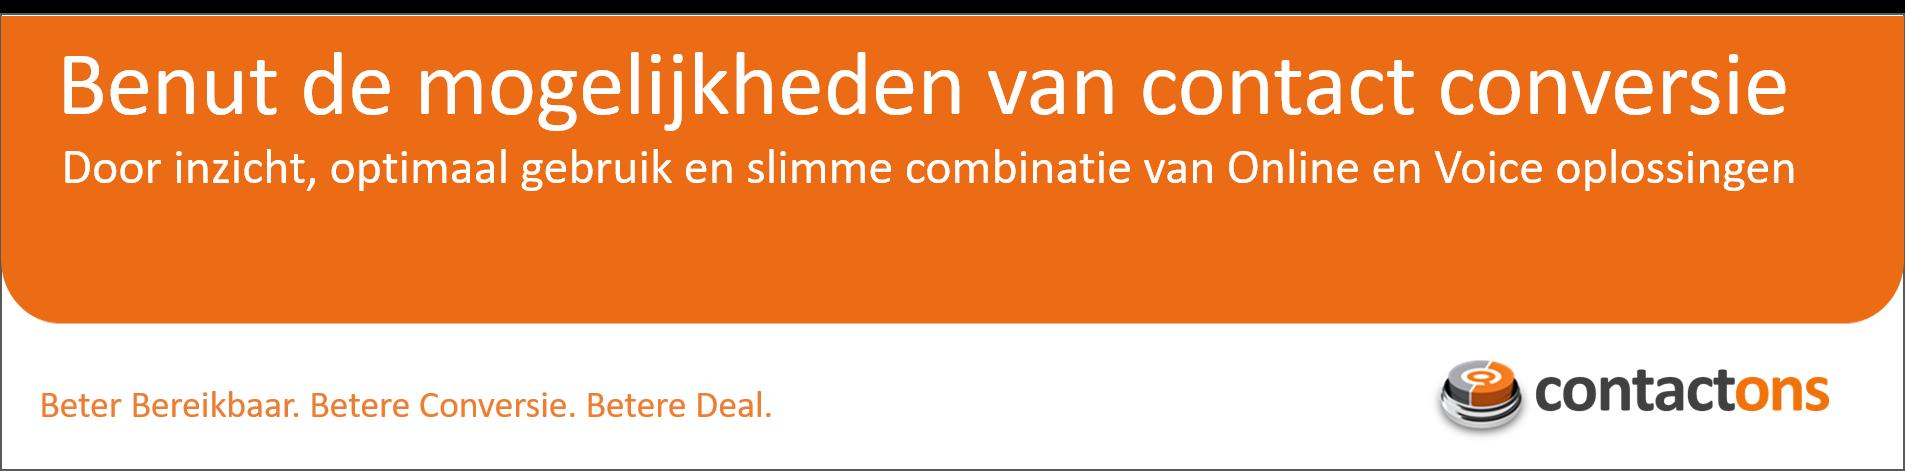 contactons.nl-contact-conversie-conversational-commerce-en-service